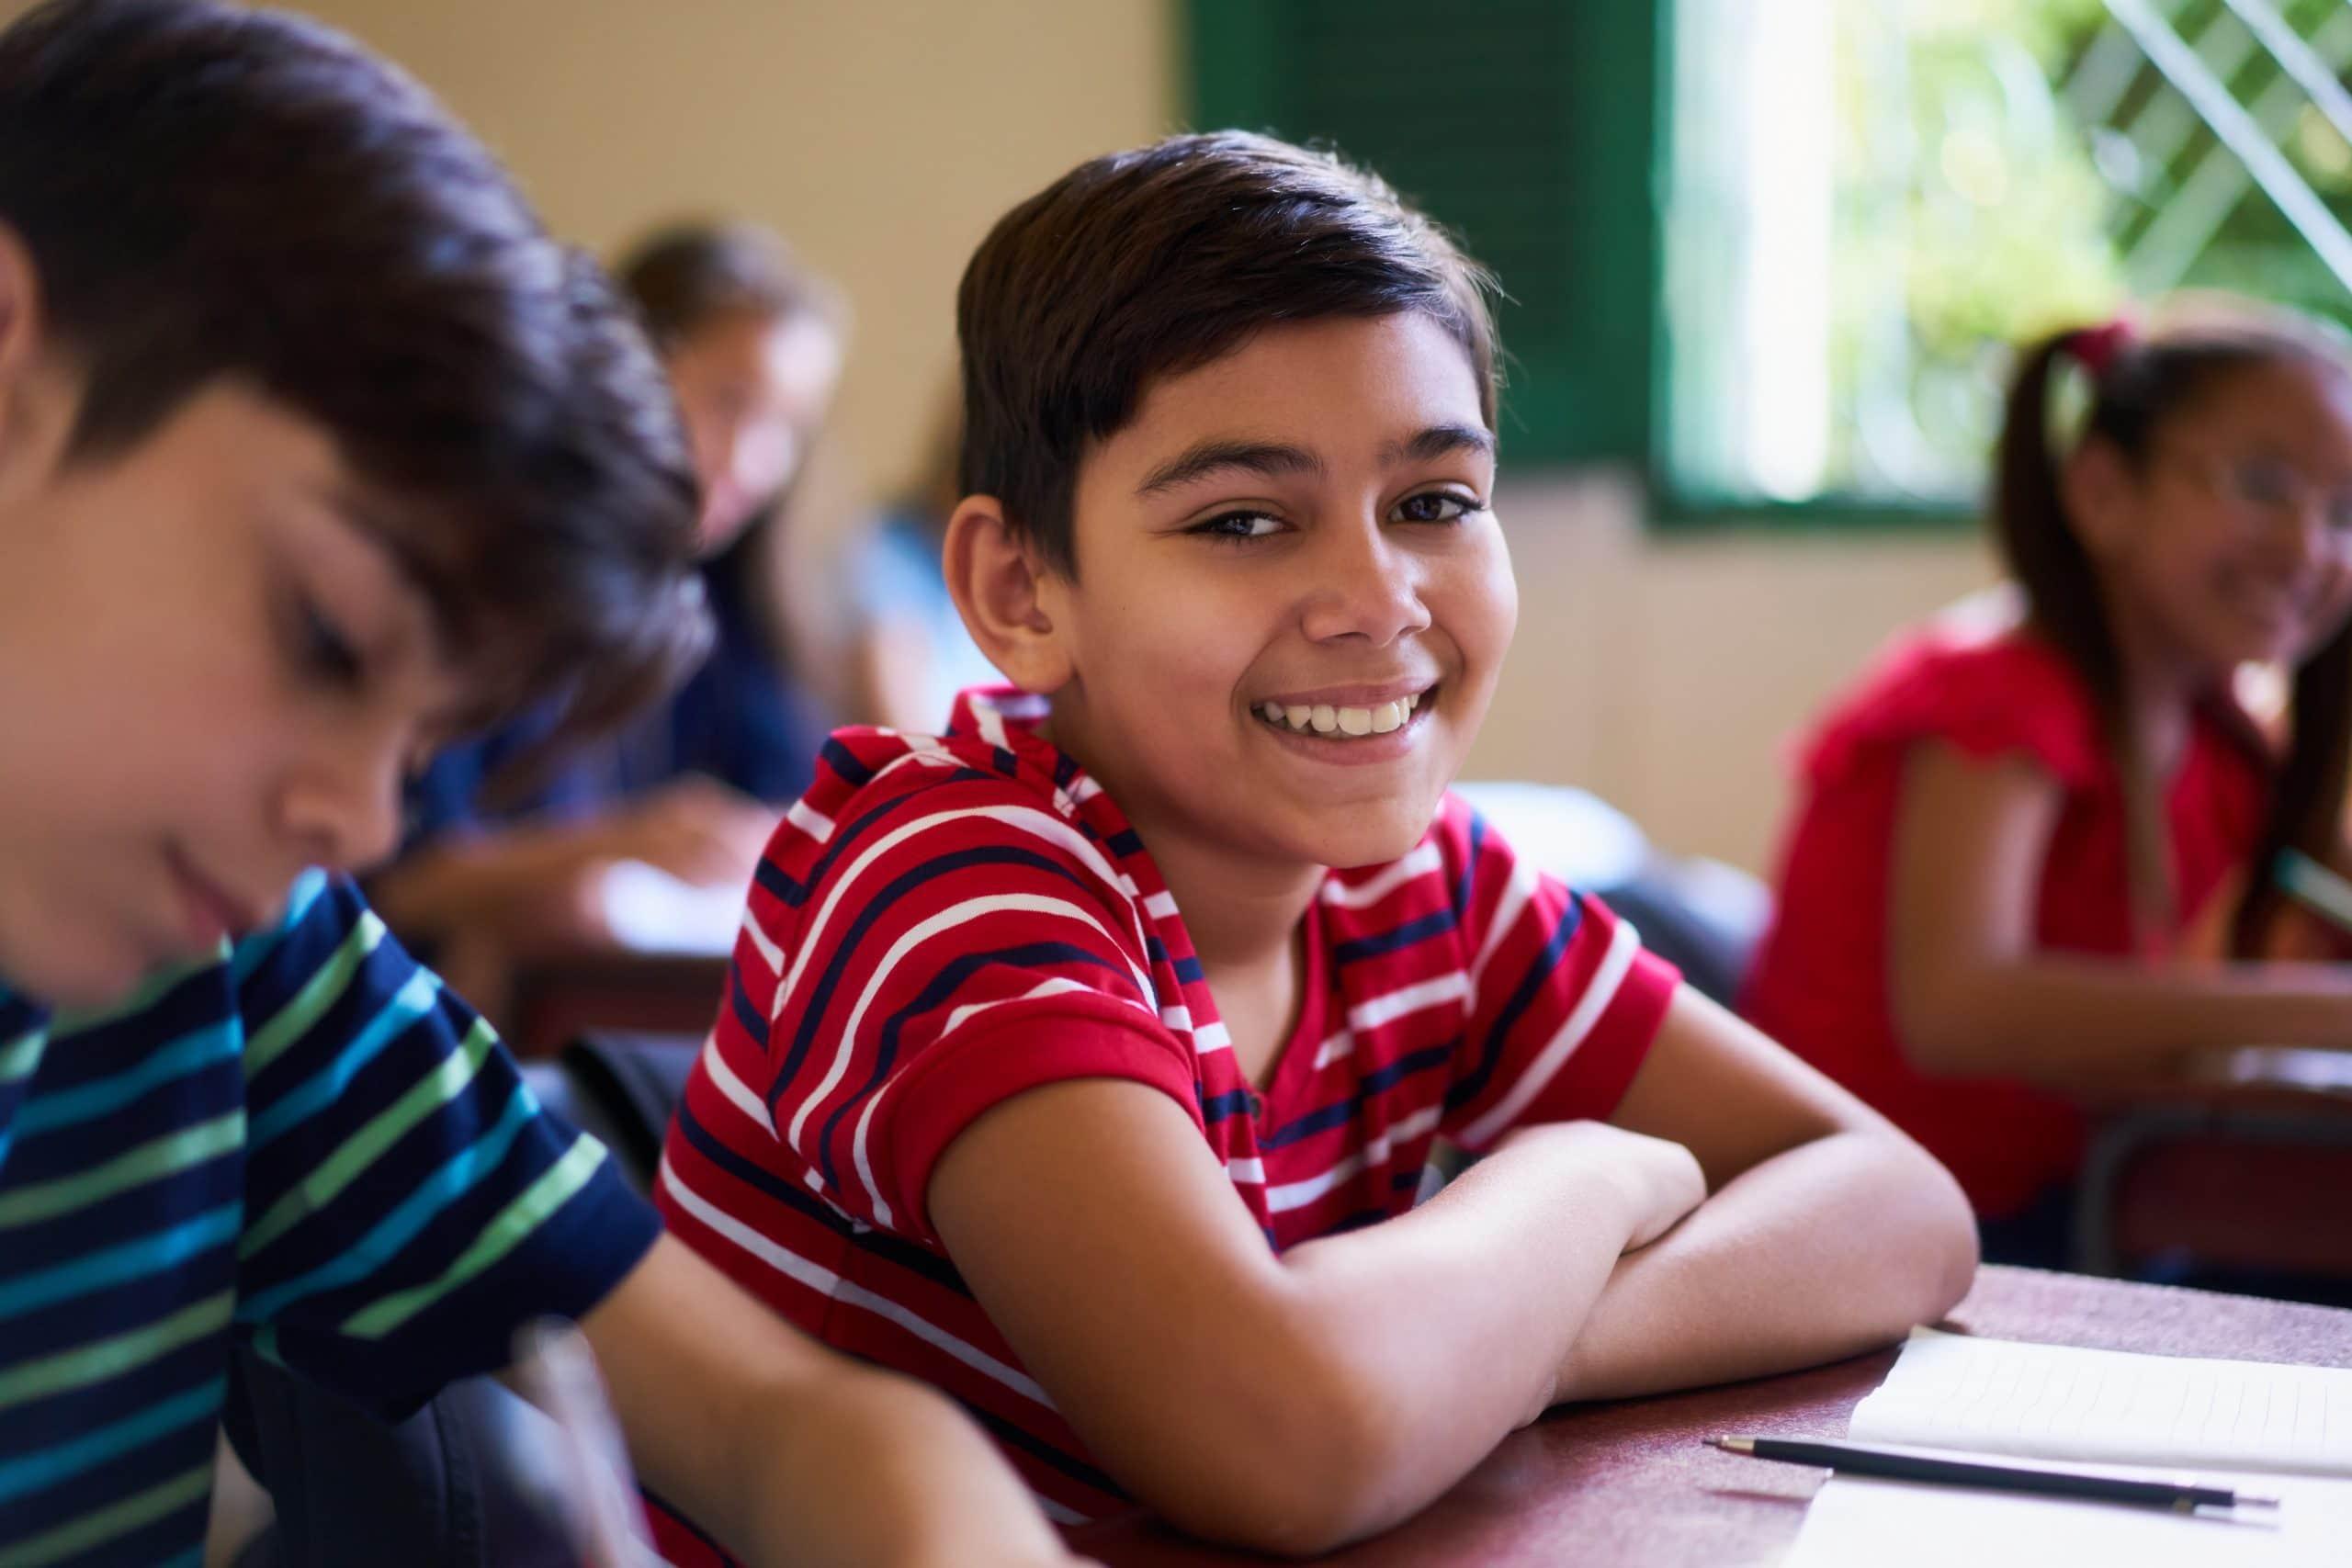 Kid at school smiling